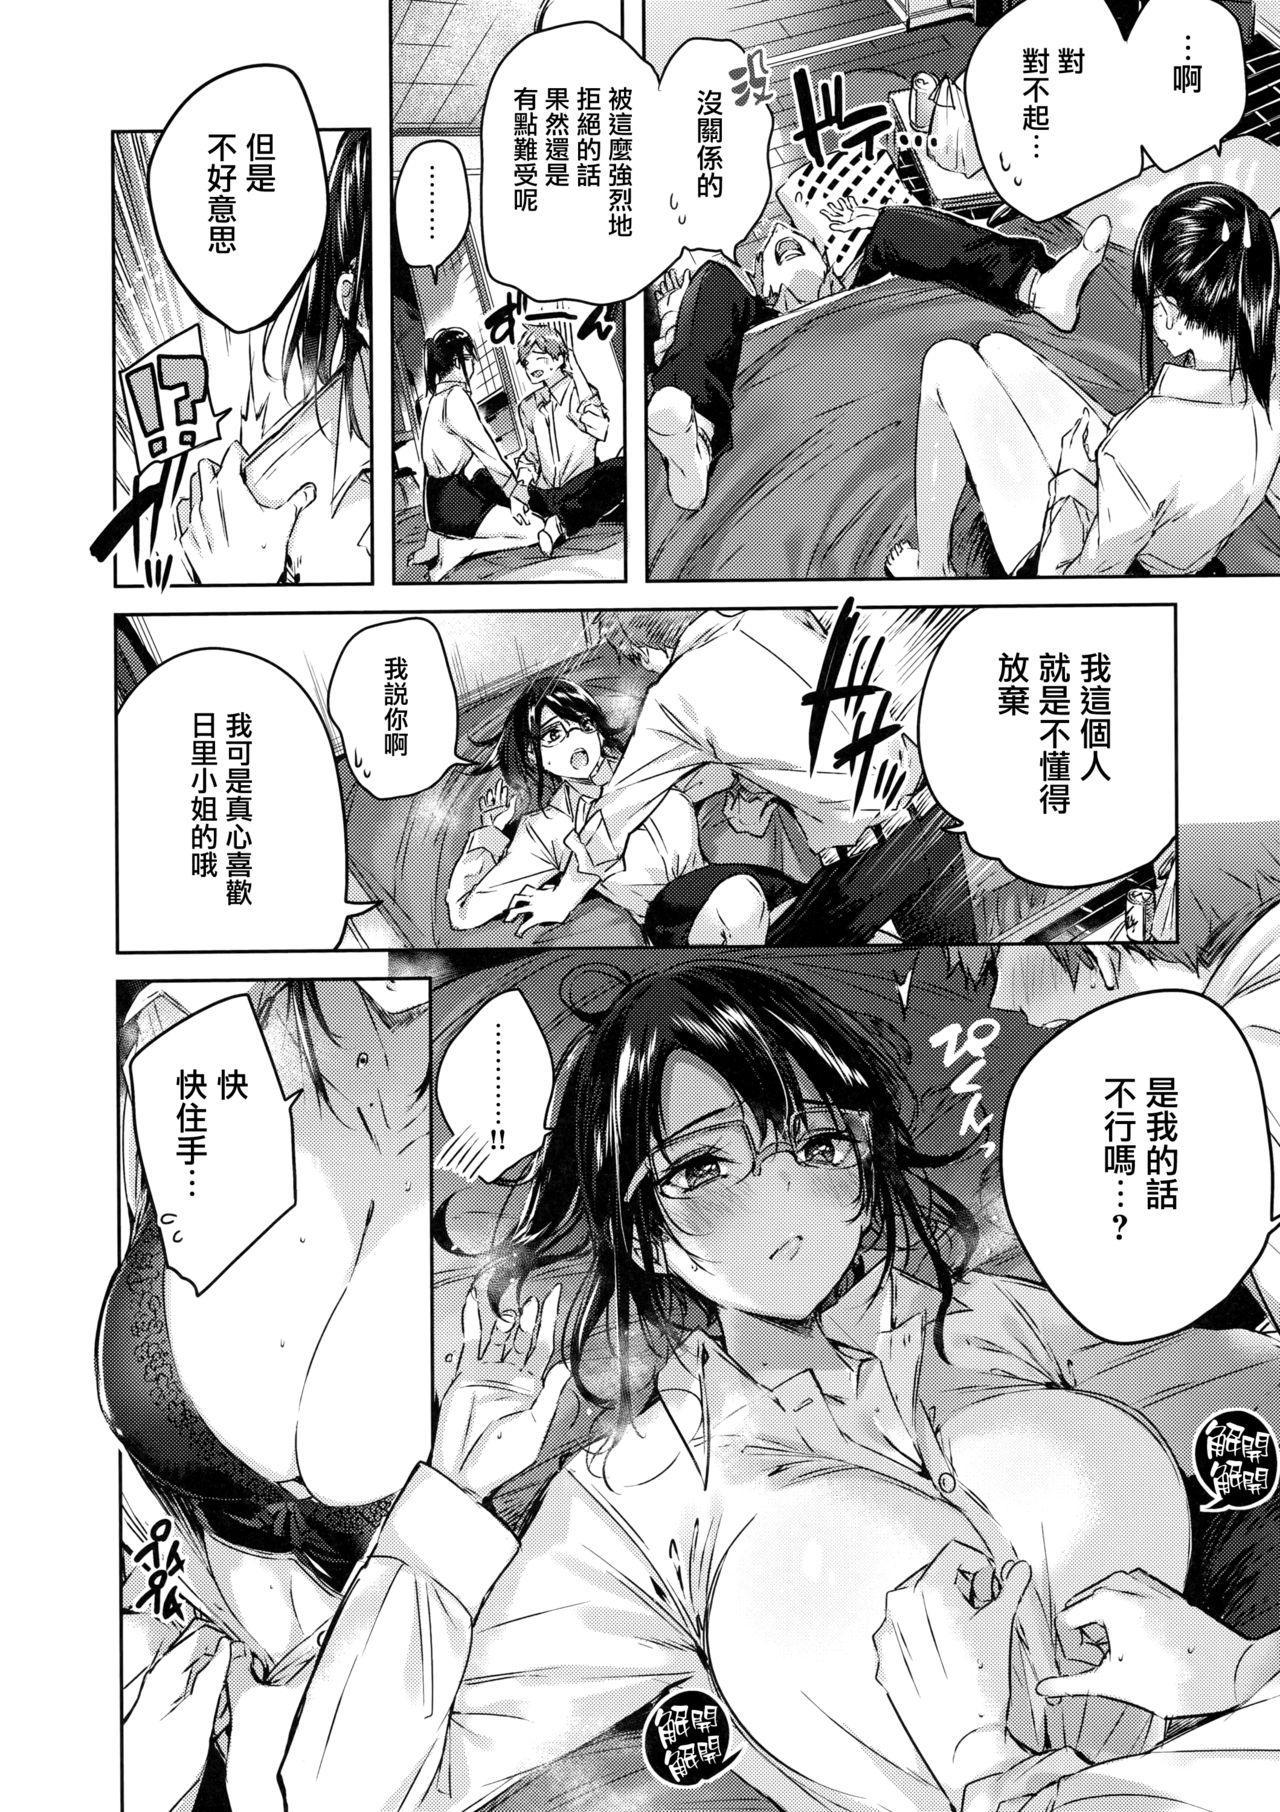 [Kakao] Nakadashi Strike! - Winning strike! Ch. 1-2  [Chinese] [兔司姬漢化組] 31